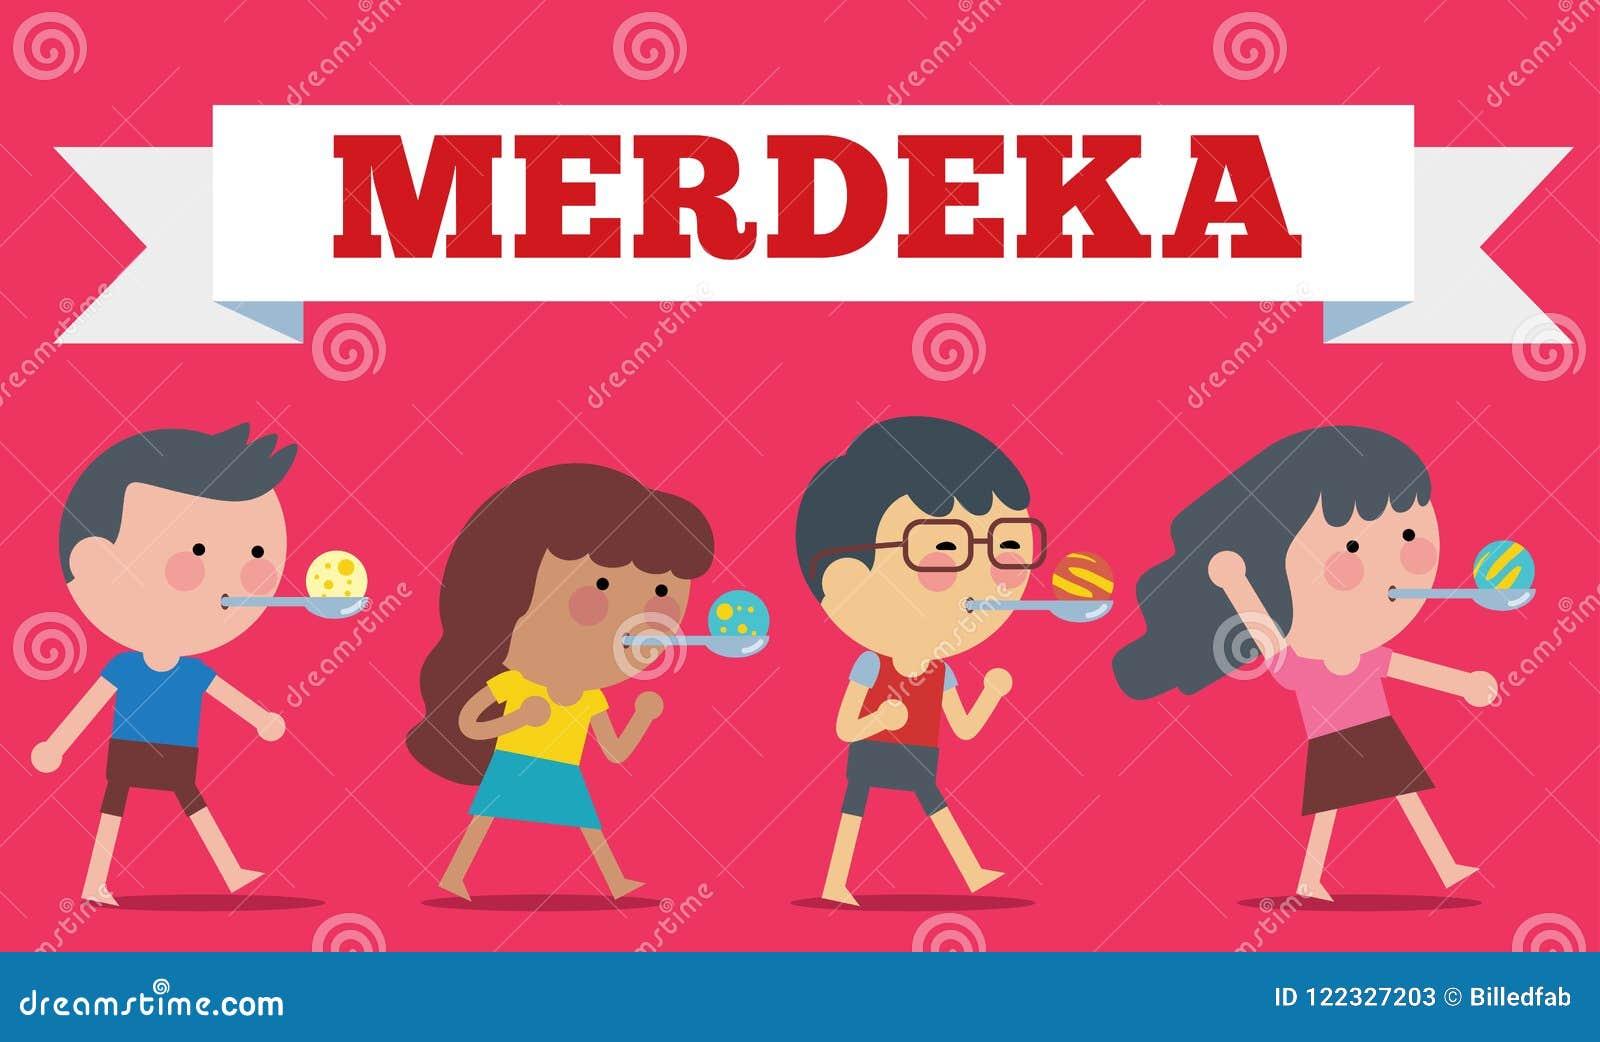 Stock vector of Illustration on Hari Merdeka ,Independence Day of Indonesia. Flat Illustration style.